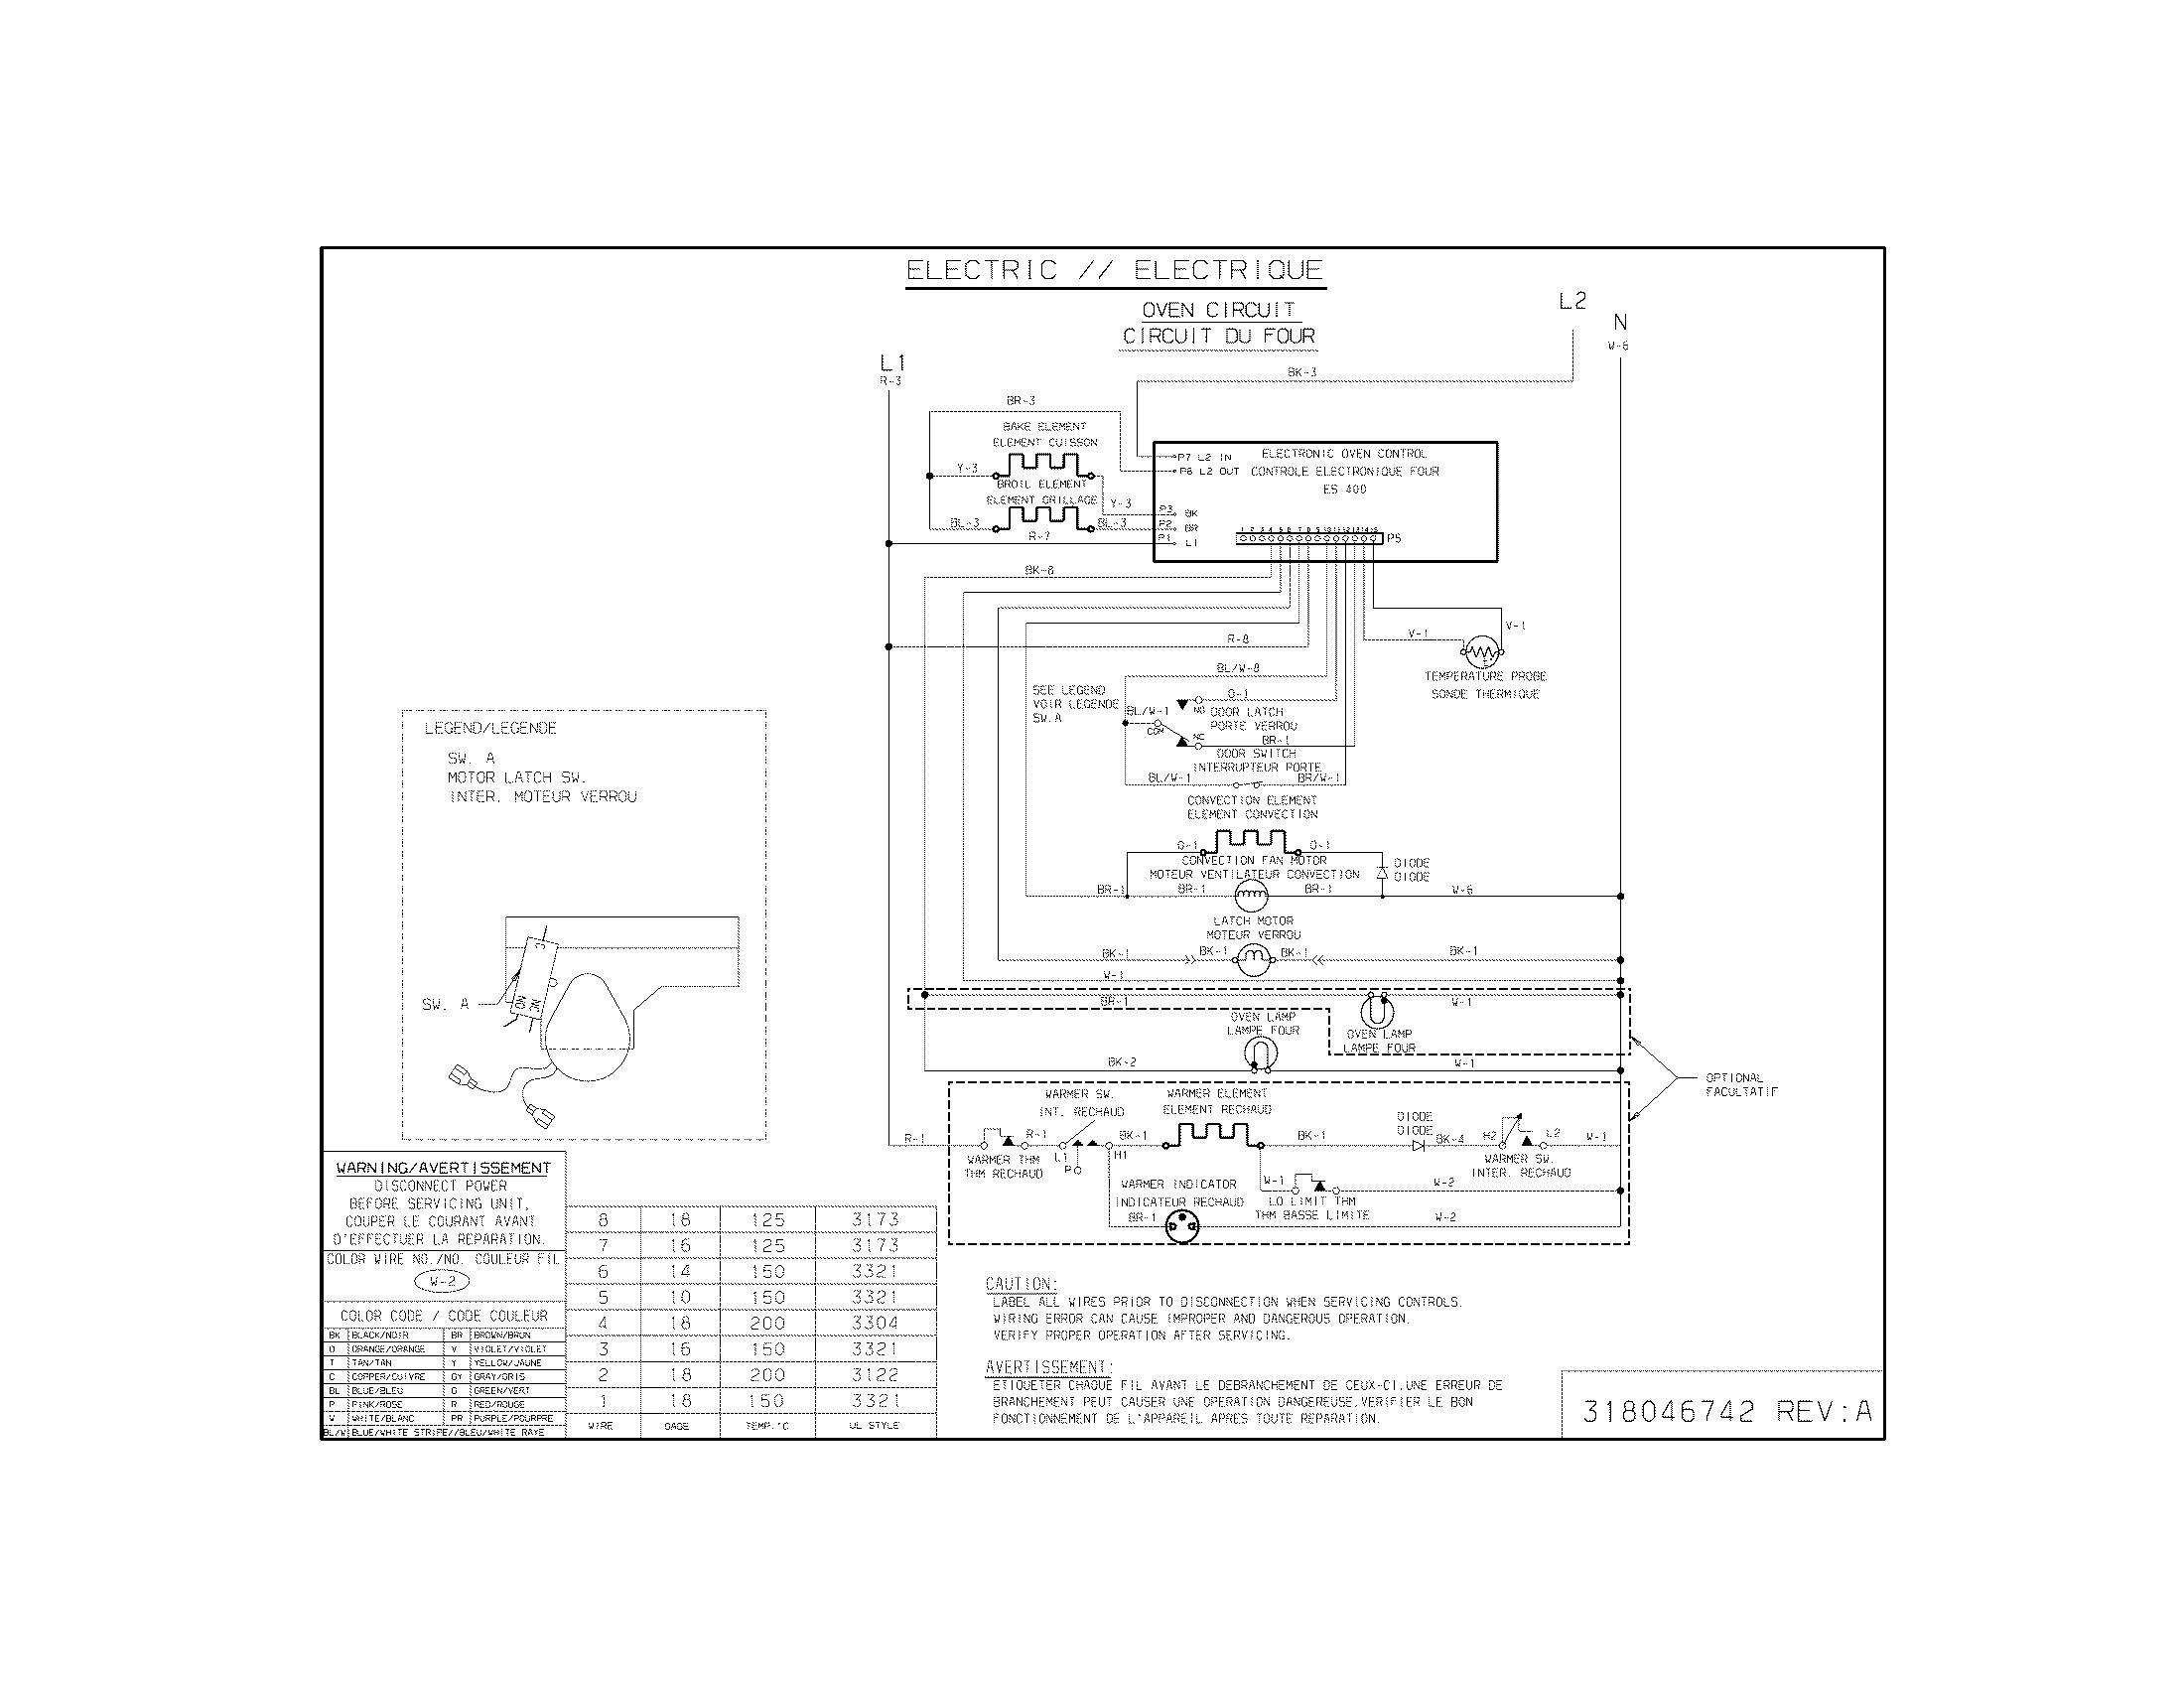 wiring diagram for a electrolux 3 way fridge ps300 emergency ballast pglef385cs3 electric range timer stove clocks